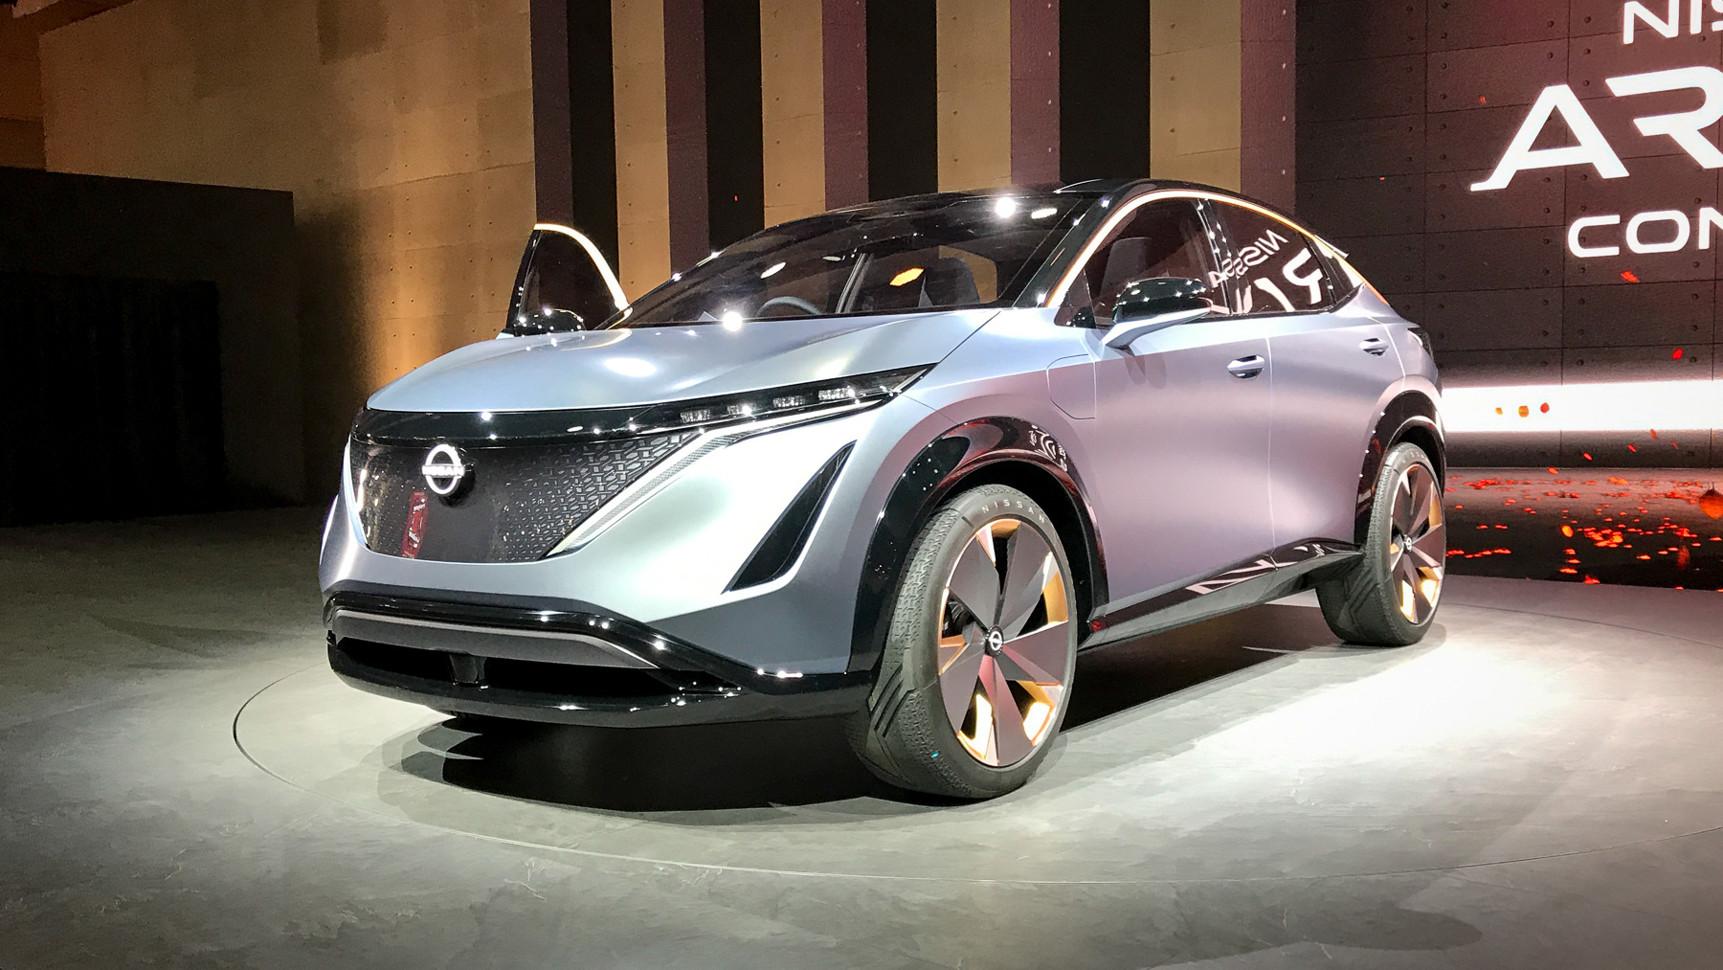 На автосалоне в Токио анонсирован новый кроссовер Nissan Ariya